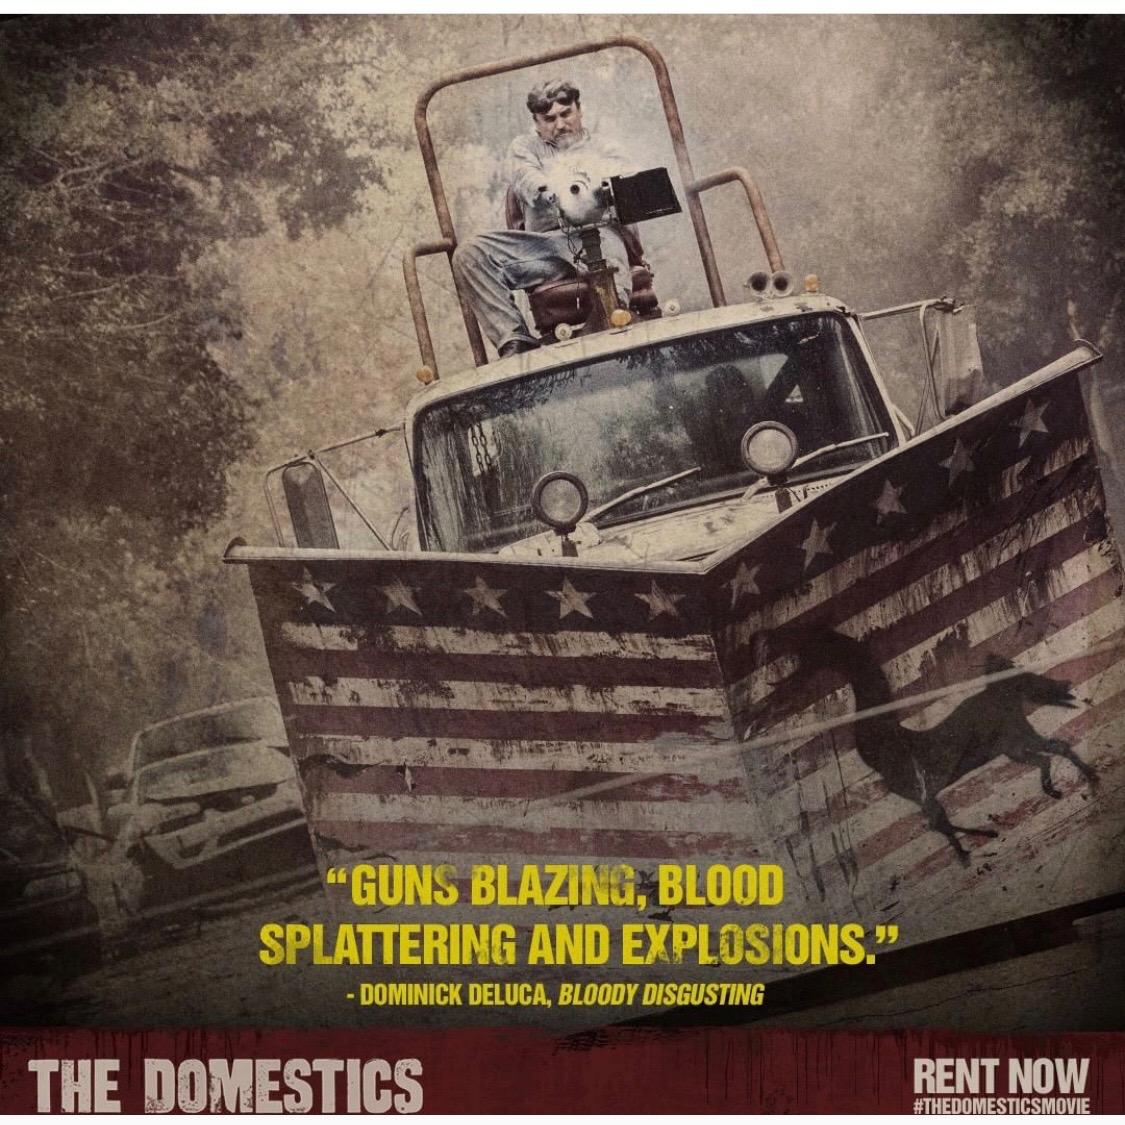 The Domestics  Alfonso Bresciani/MGM Studios